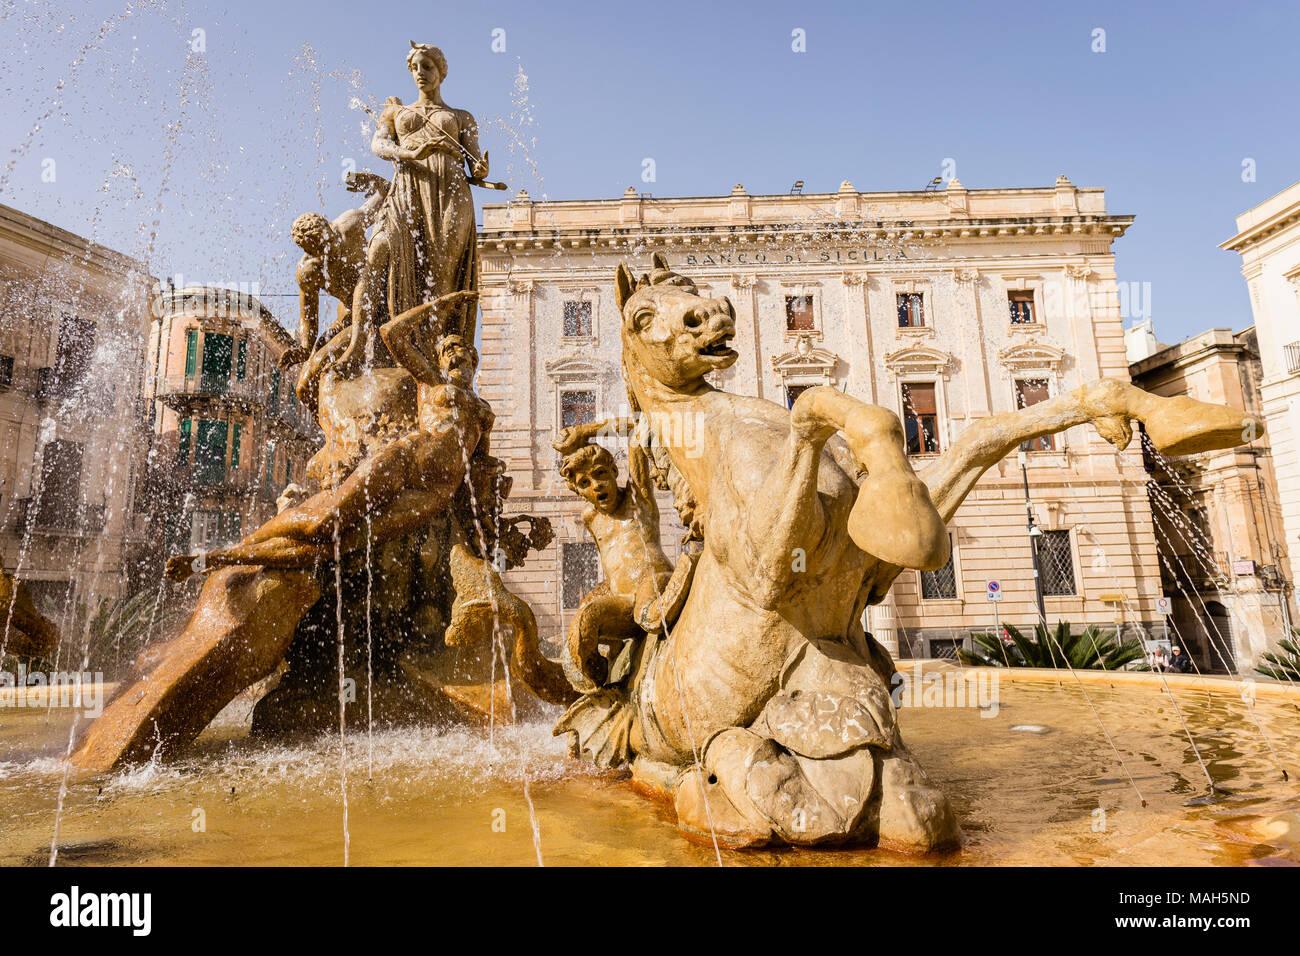 Fountain of Diana, Ortigia, Siracusa, Sicily. - Stock Image